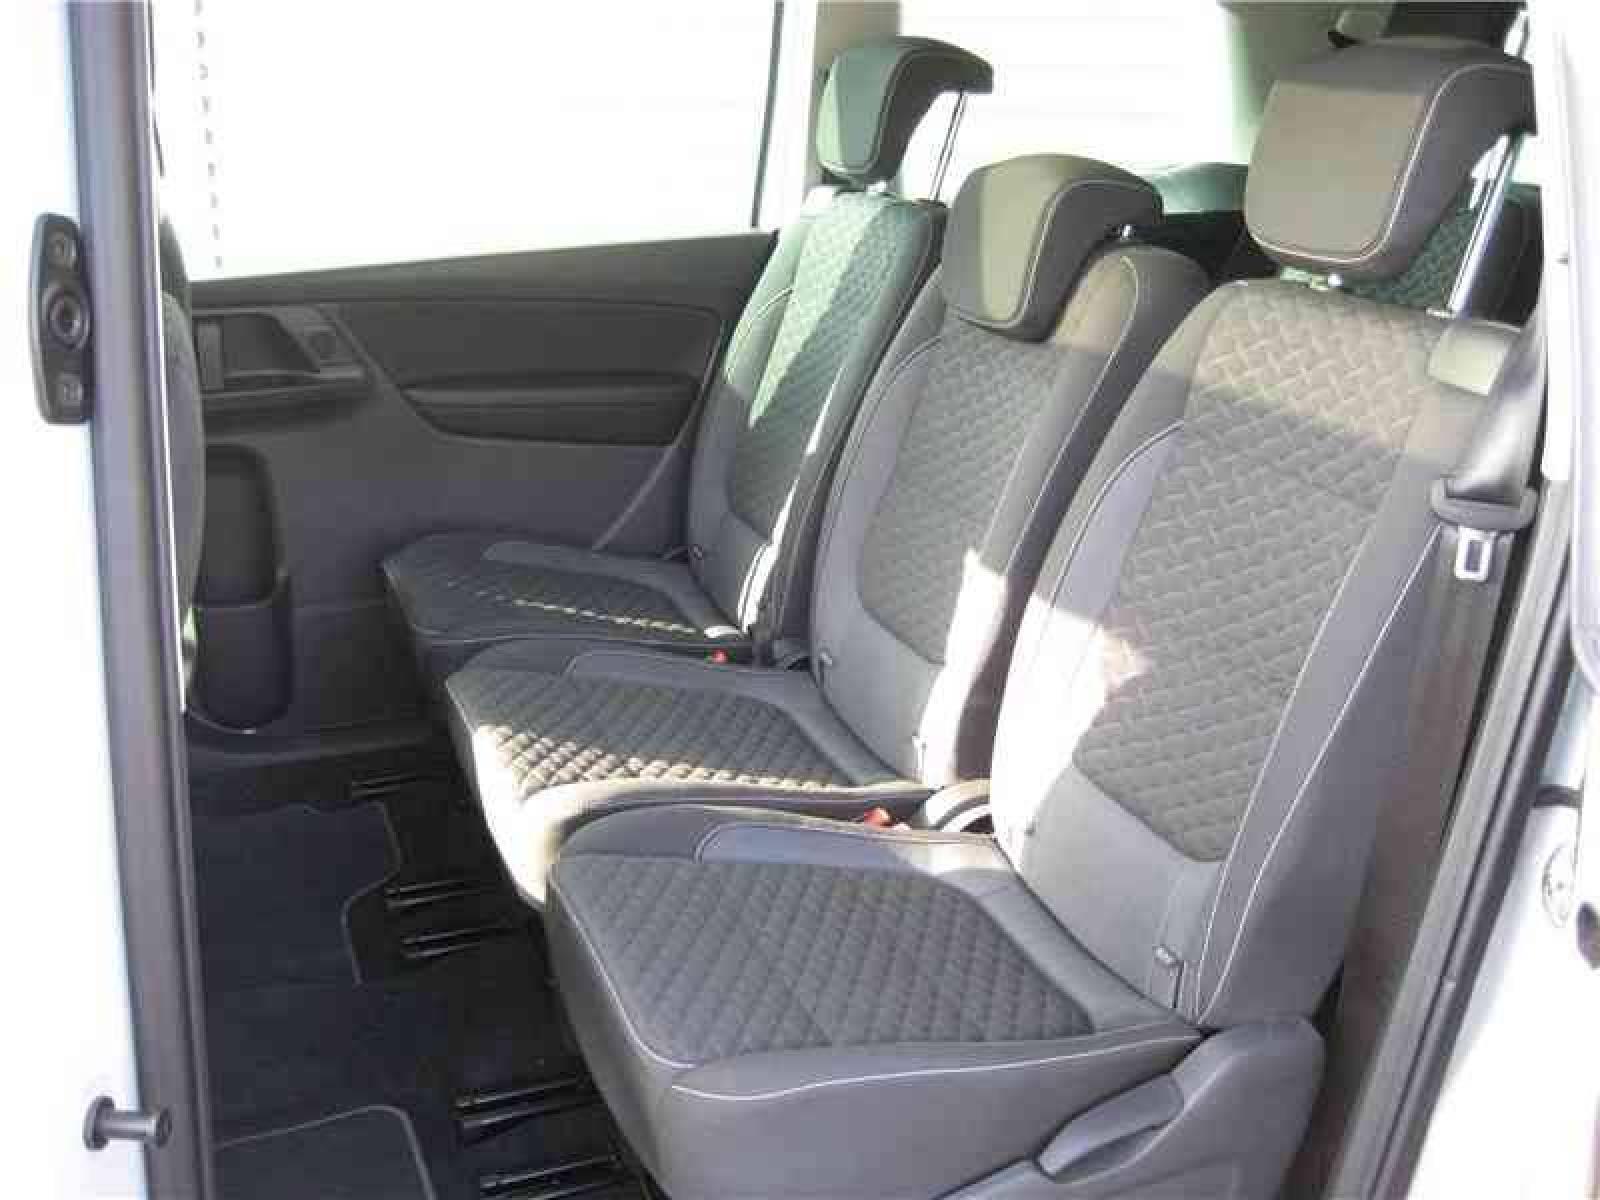 VOLKSWAGEN Sharan 2.0 TDI 150 BlueMotion Technology DSG6 - véhicule d'occasion - LEMAUVIEL AUTOMOBILES - Présentation site web V2 - Lemauviel Automobiles - VIRE - 14500 - VIRE - 15